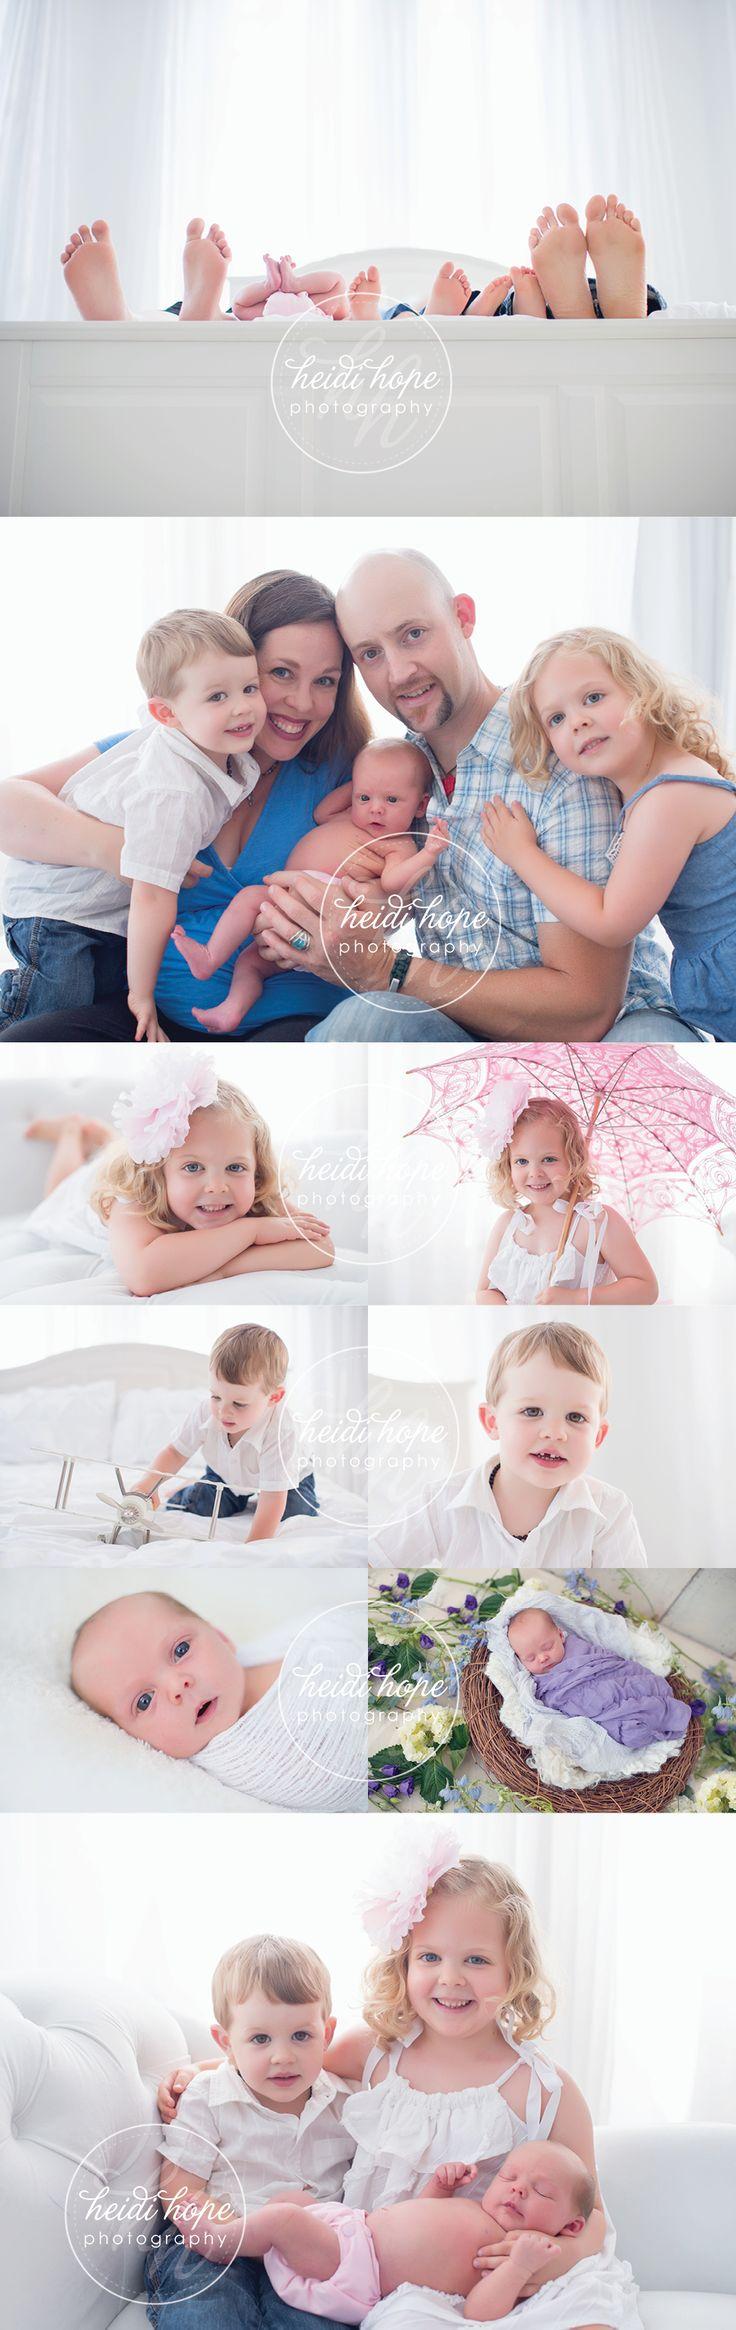 Family and newborn session!  #family #newborn #allsmiles